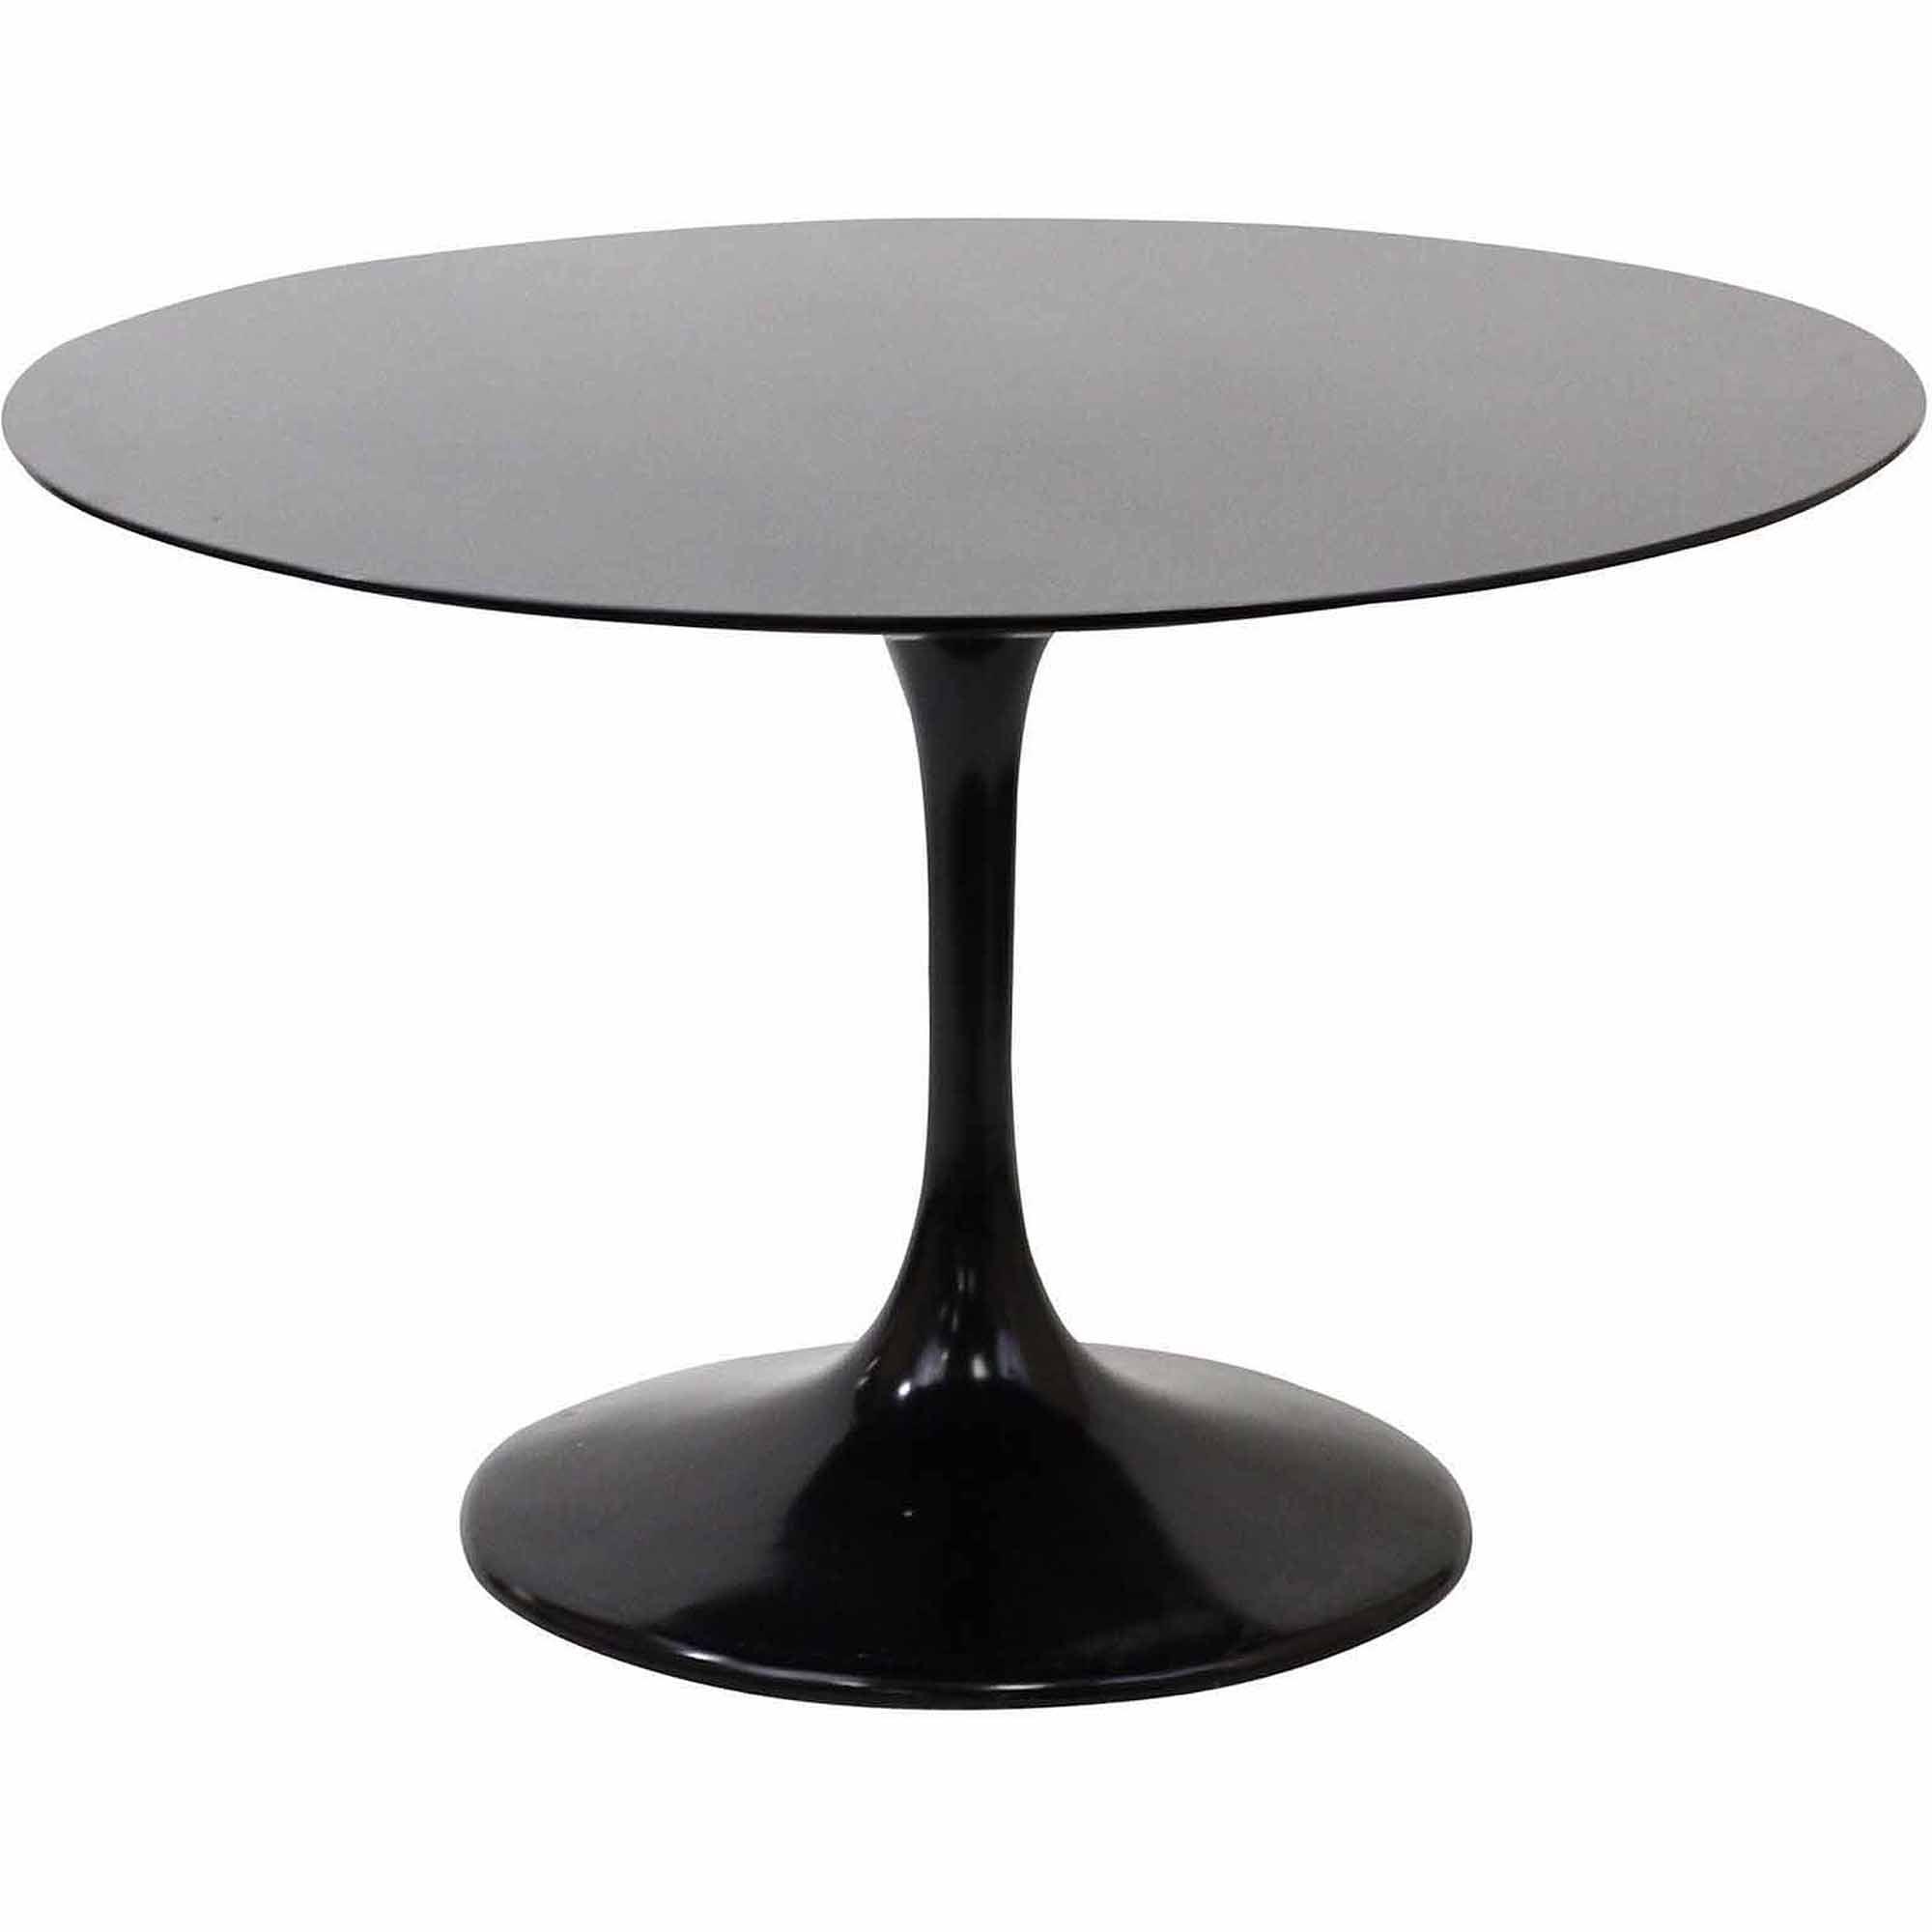 Black outdoor dining table - Modway Lippa 48 Fiberglass Dining Table Multiple Colors Walmart Com